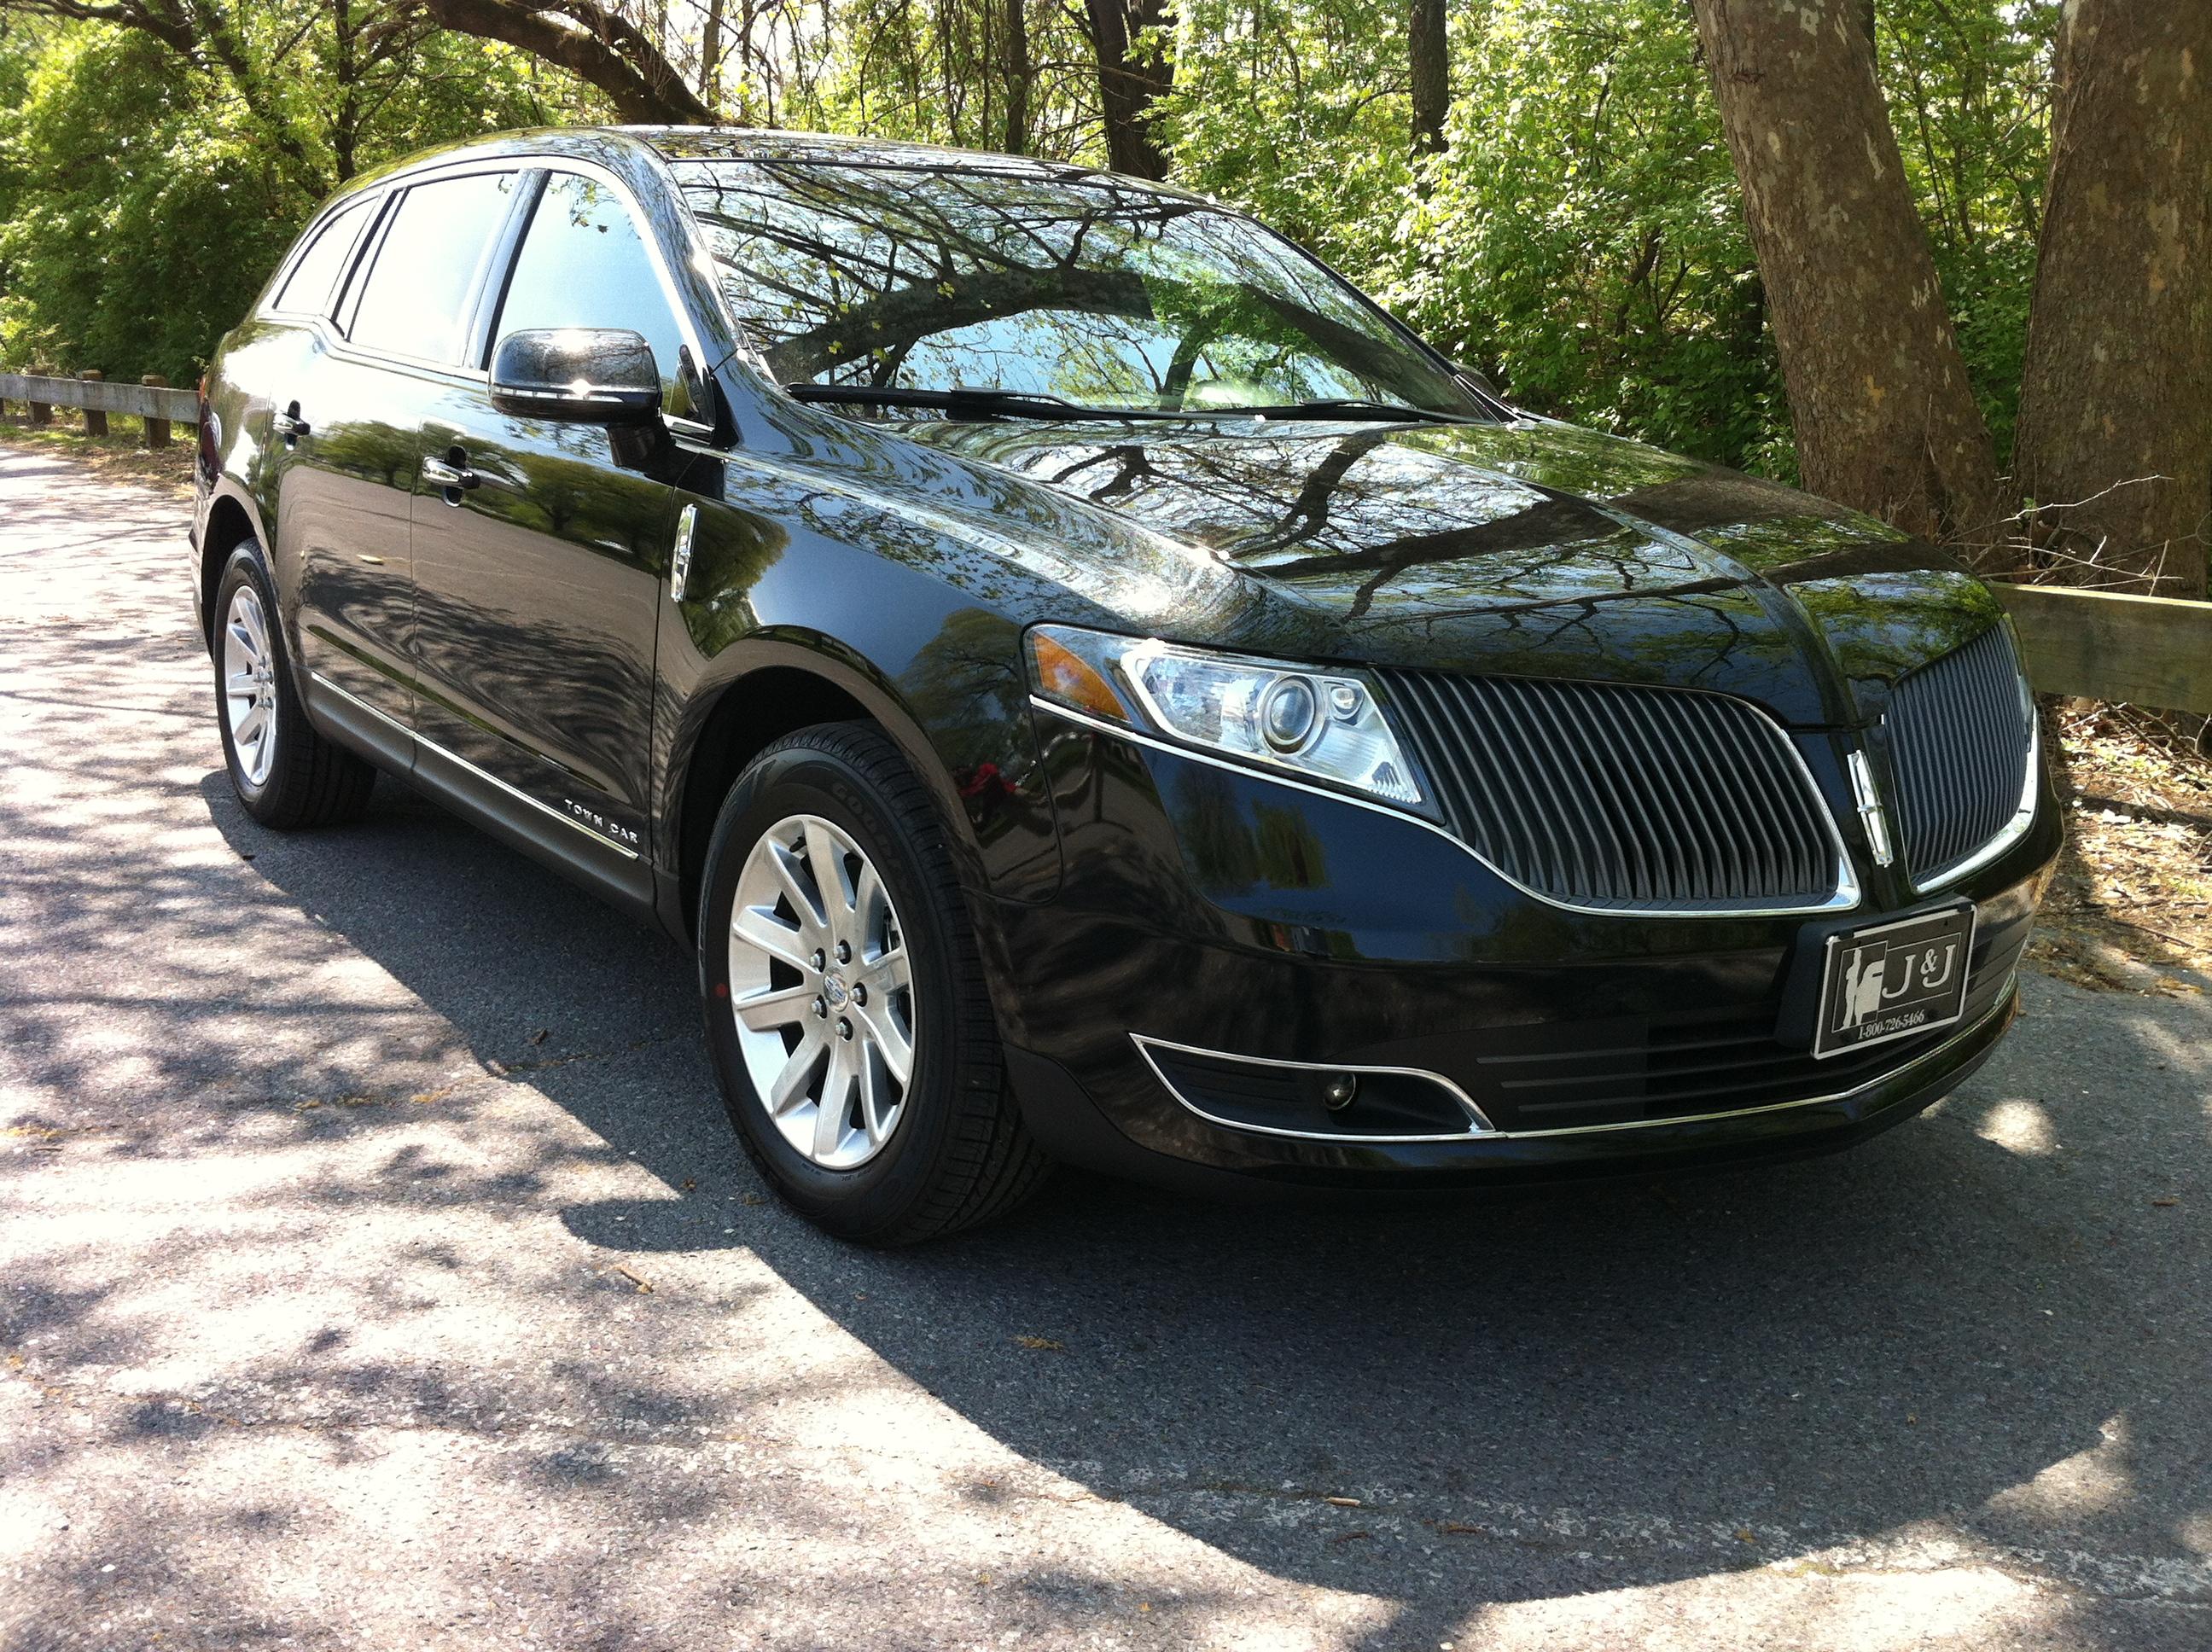 Vehicles Sedans Vans Limousines Suvs And Buses J J Luxury